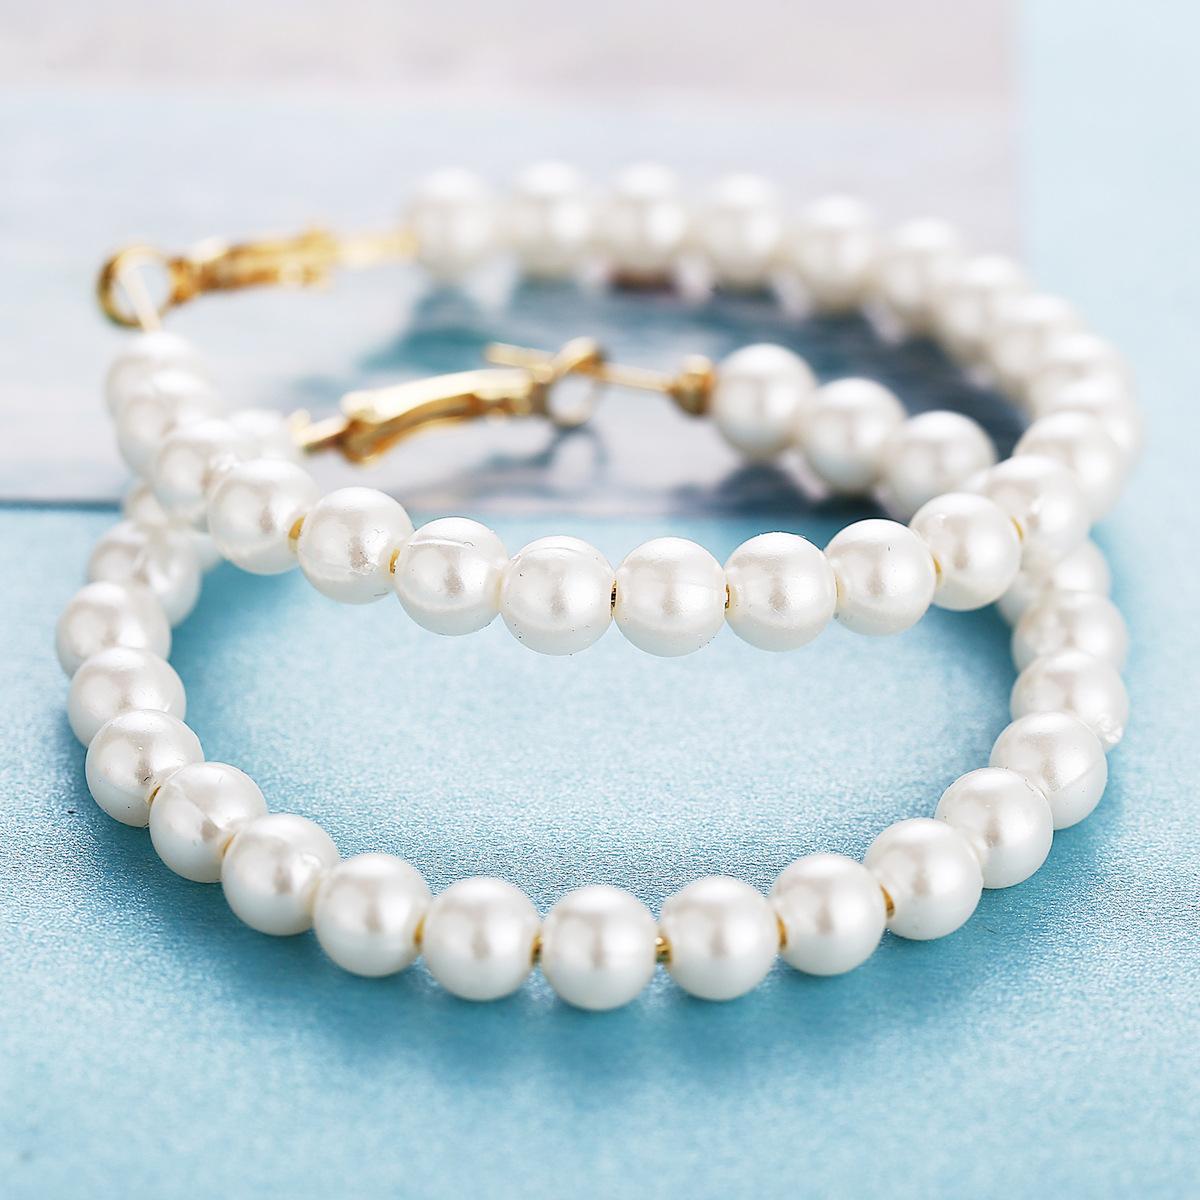 fashion explosion models white full pearl earrings new creative retro simple earrings wholesale nihaojewelry NHYI220231